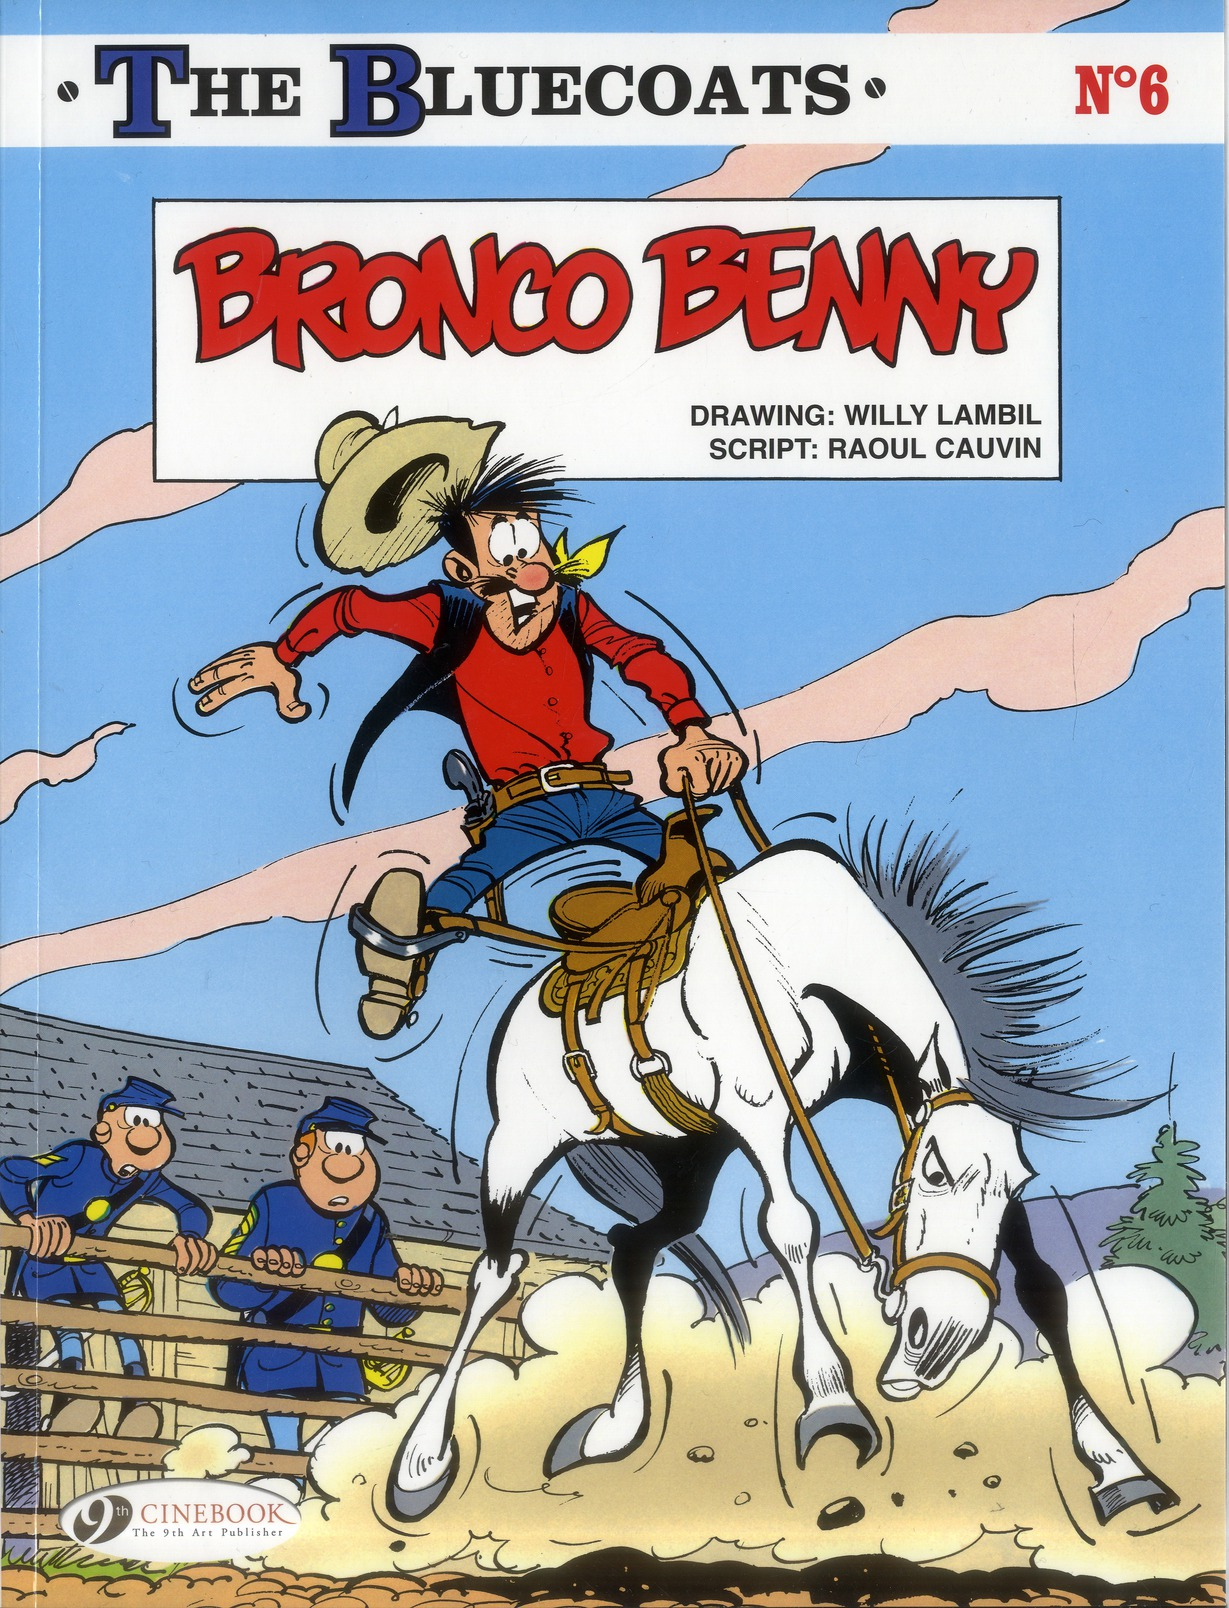 THE BLUECOATS - TOME 6 BRONCO BENNY - VOL06